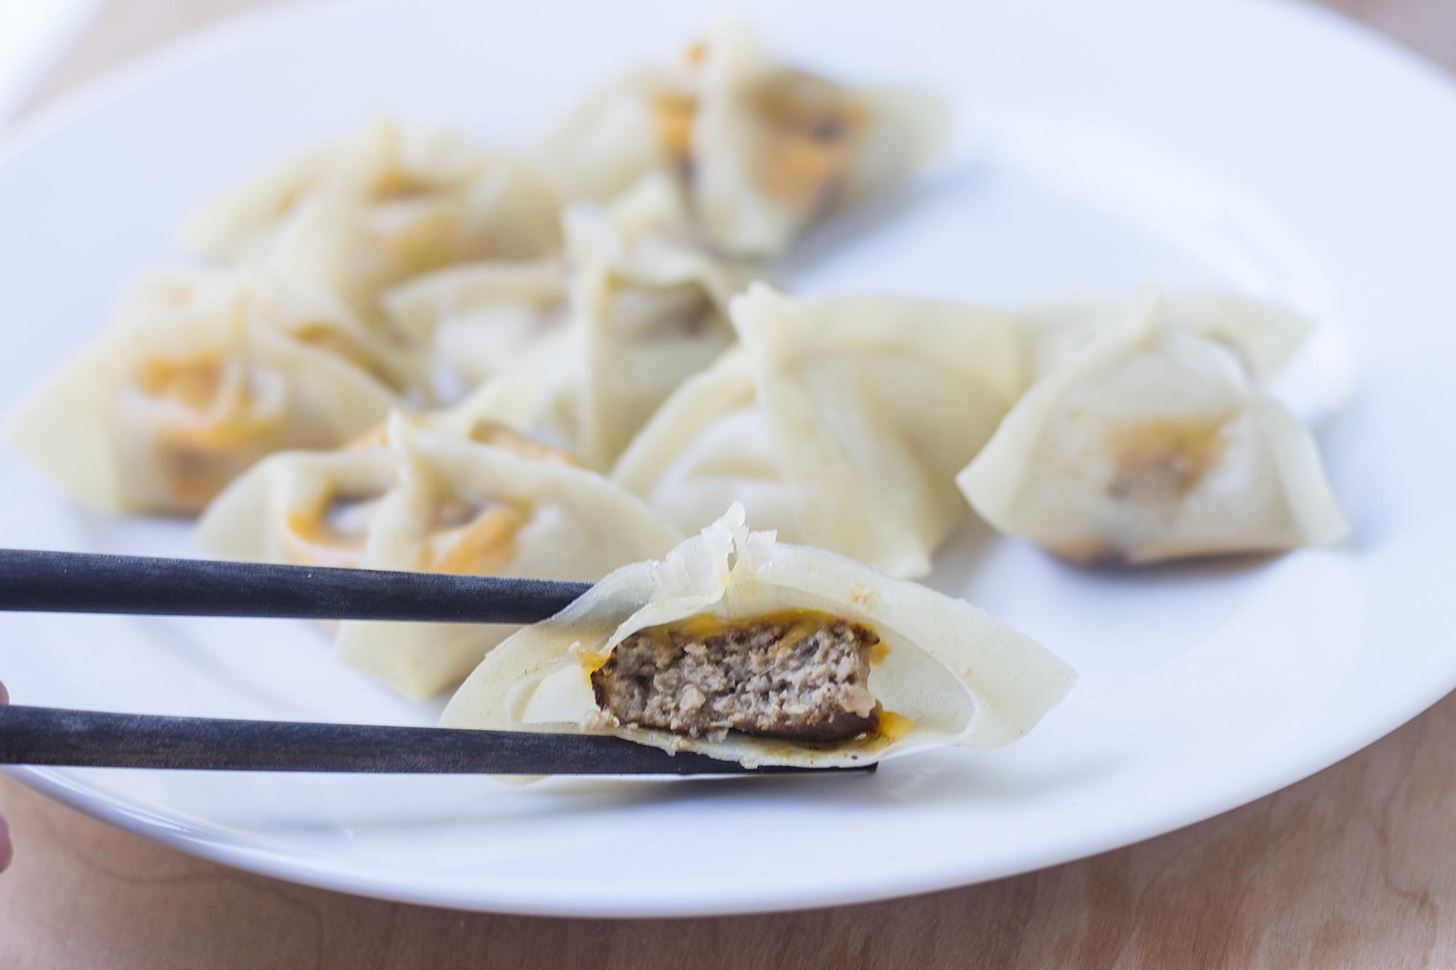 Get Creative: Make Dumplings with Cheeseburgers & Kielbasa